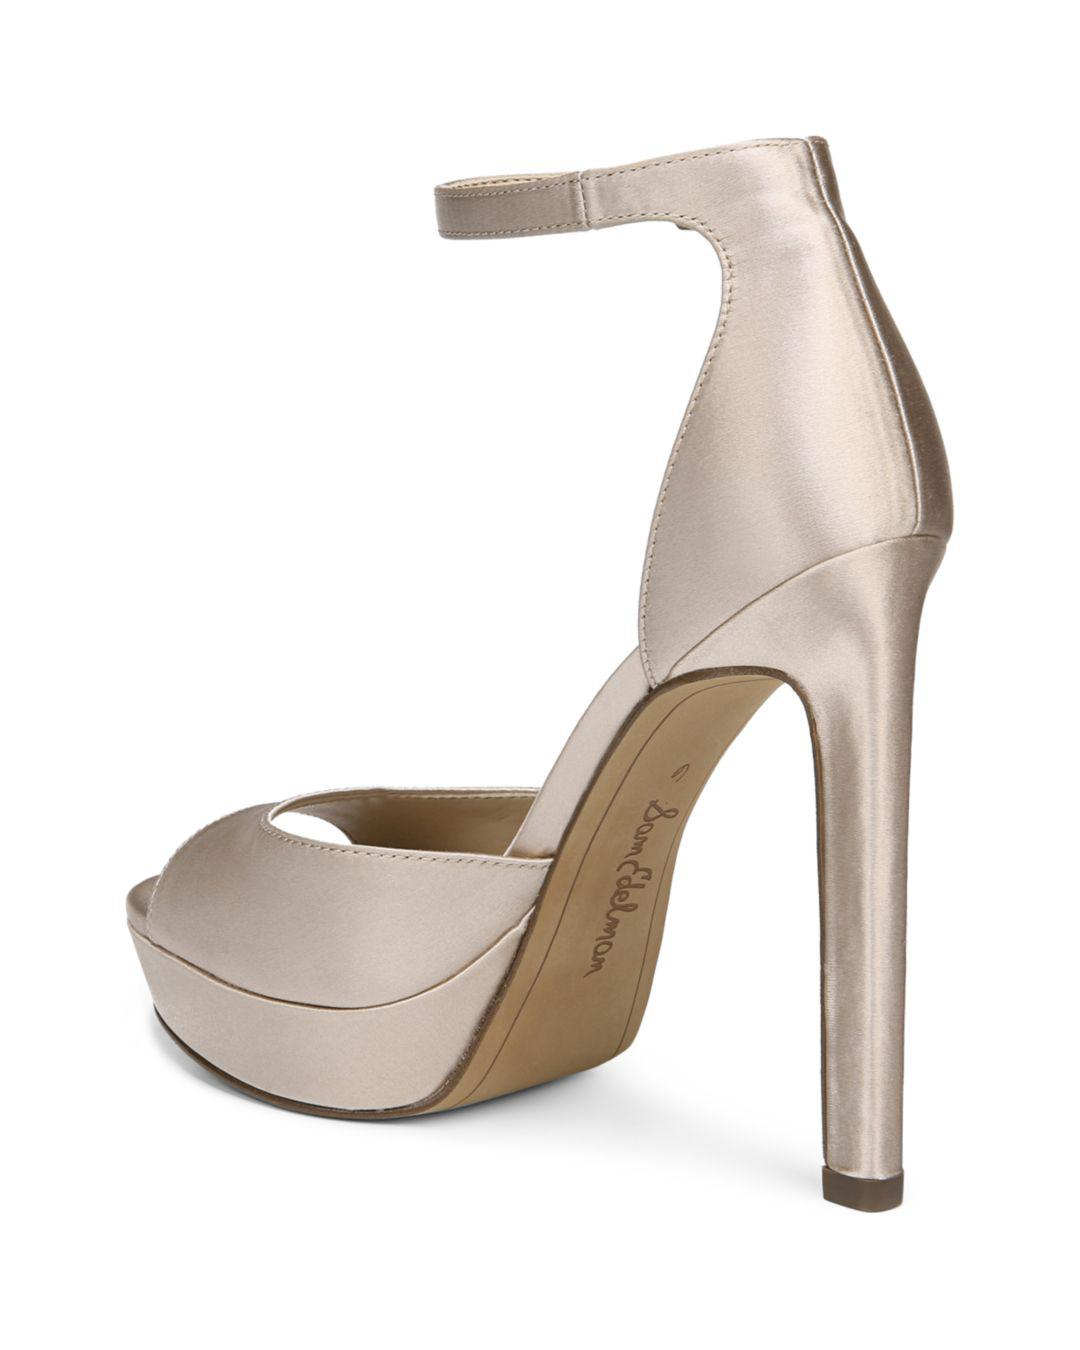 39456113c12086 Lyst - Sam Edelman Women s Wallace Satin Platform High-heel Sandals ...